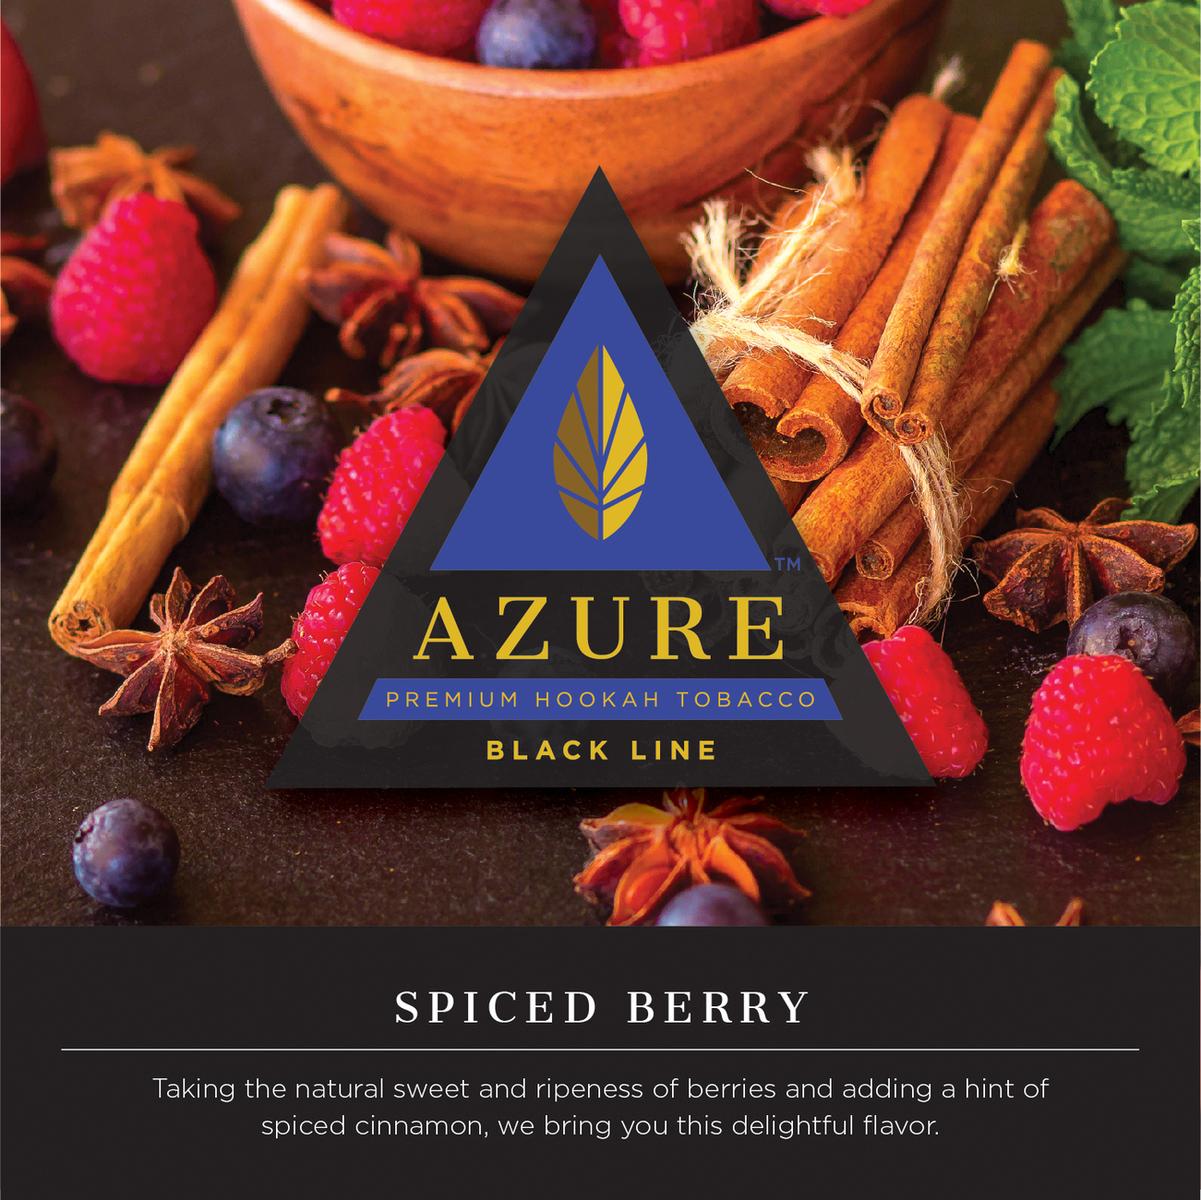 Azure Black / Spiced Berry(Raspberry系とCinnamon系のMix、余韻の微かな八角やアニスの香りが特徴)